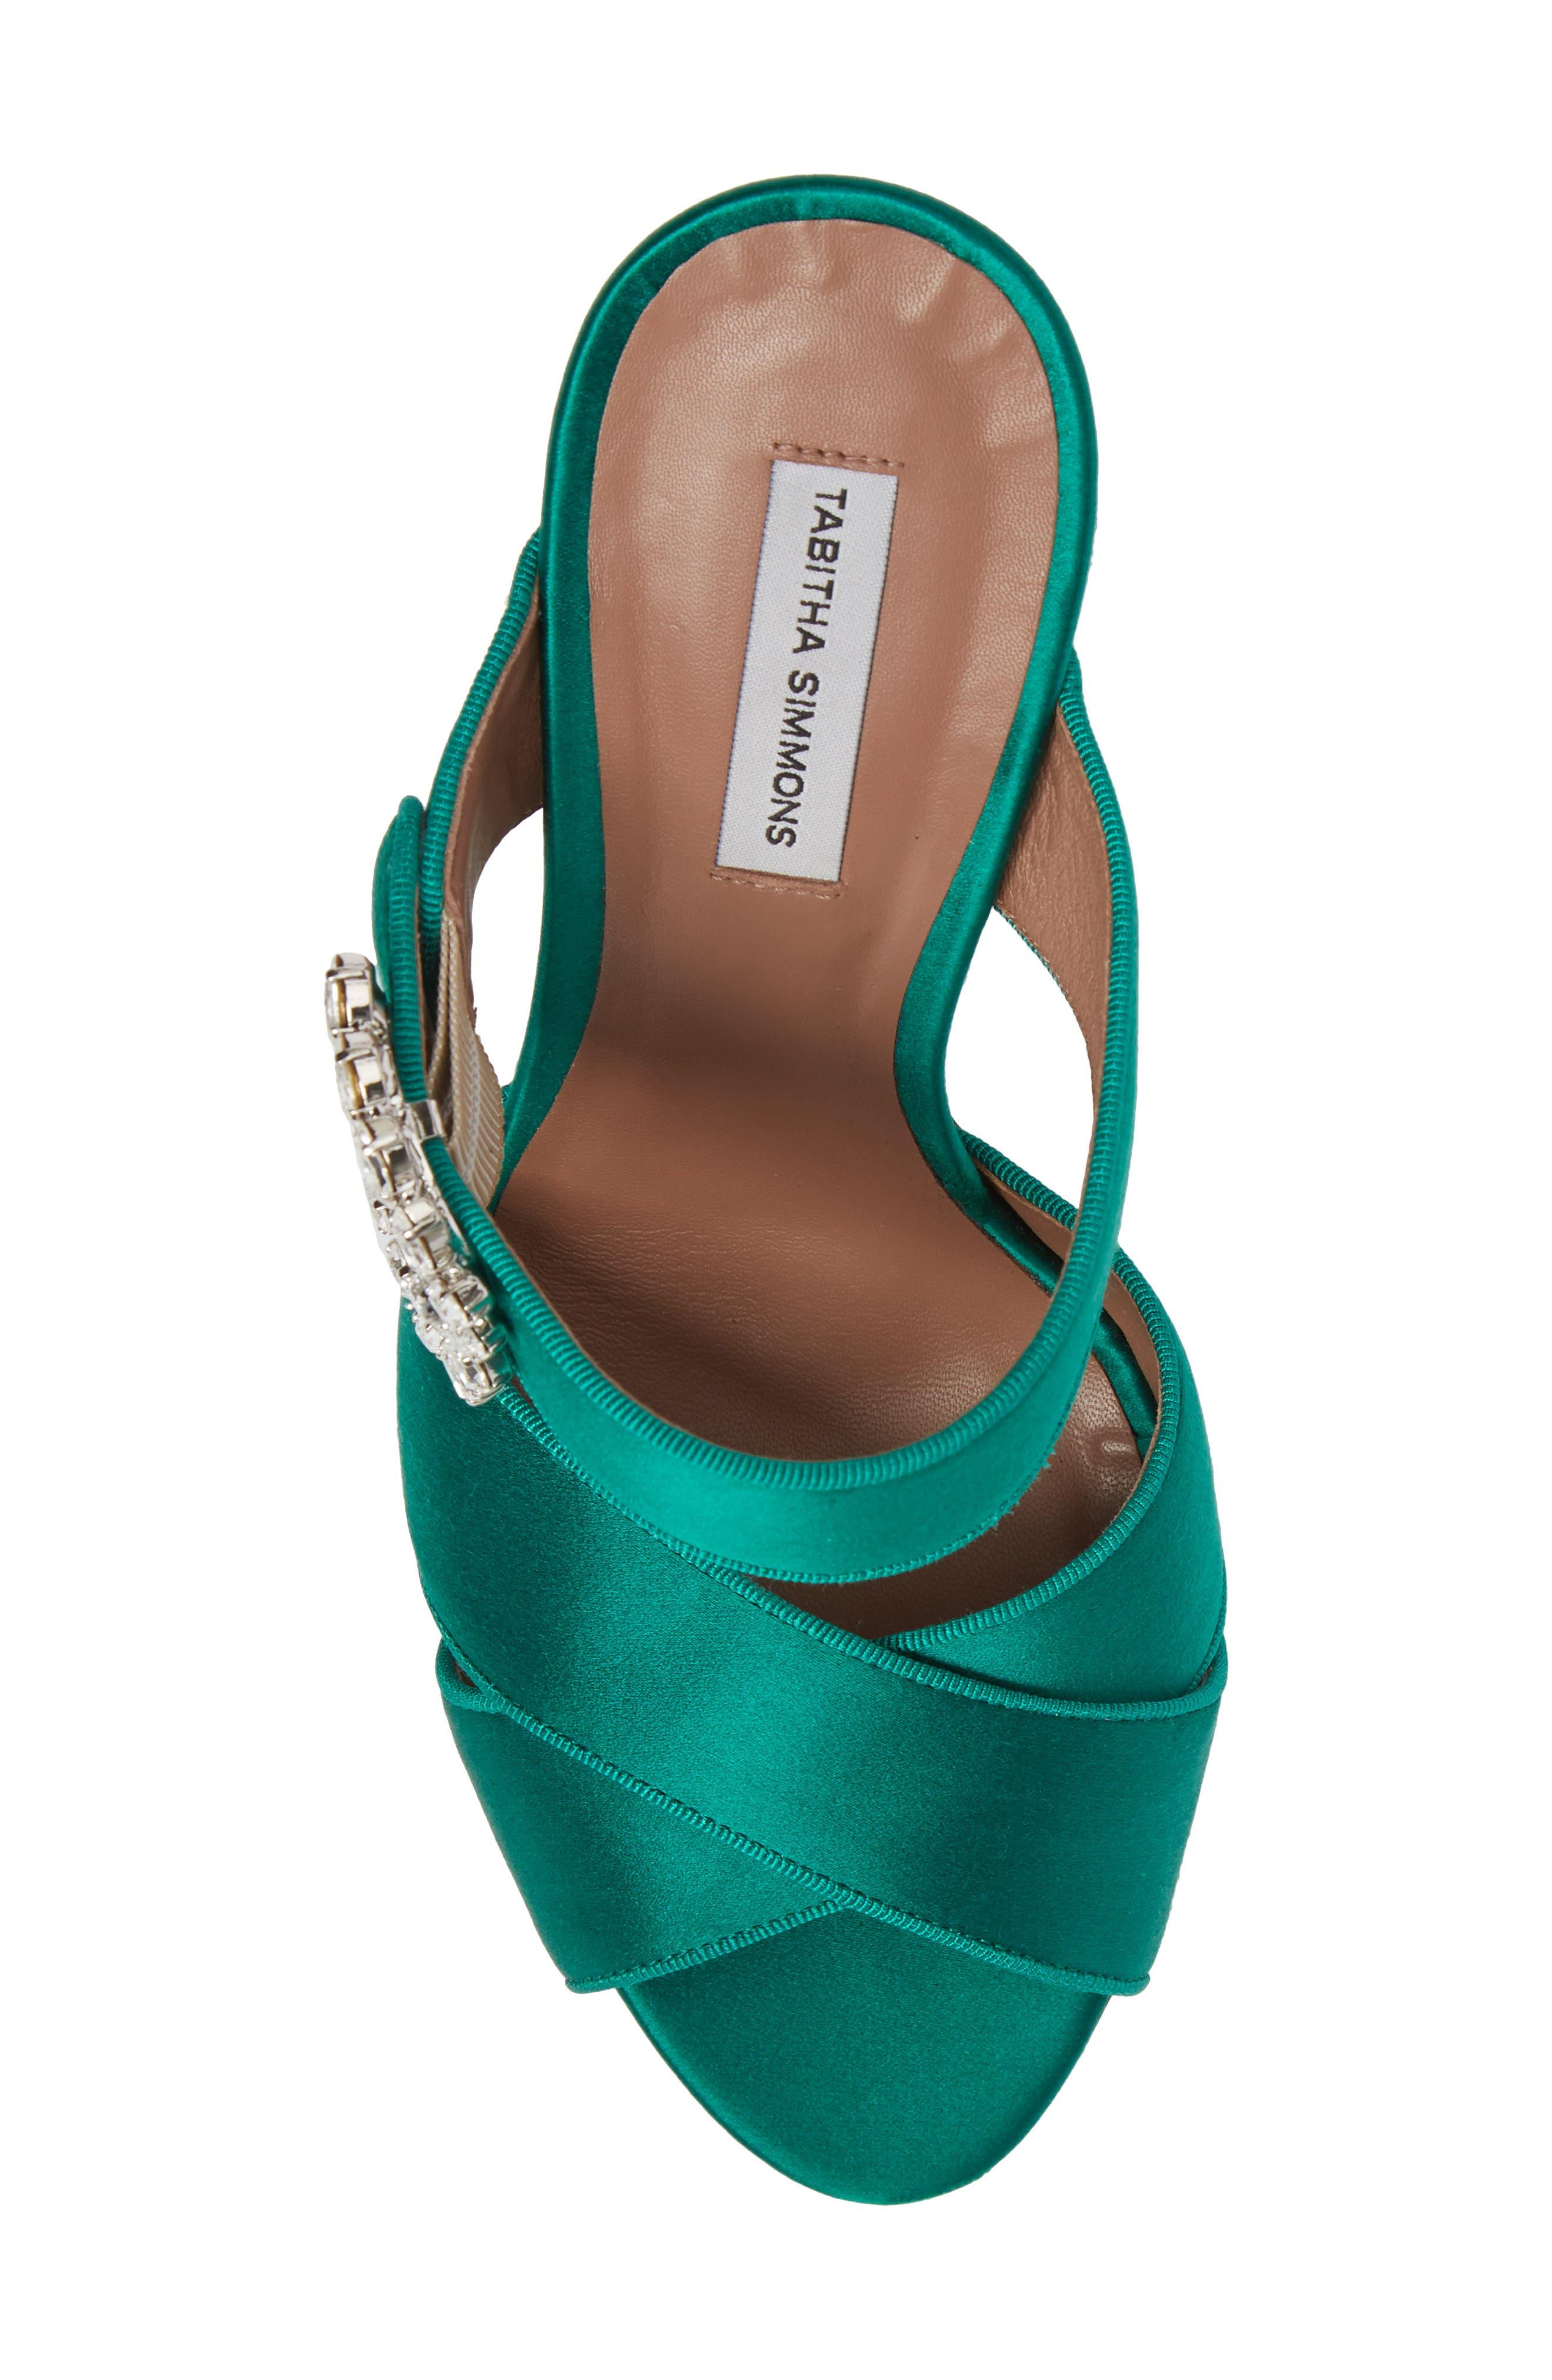 Reyner Crystal Buckle Sandal,                             Alternate thumbnail 5, color,                             Emerald Green